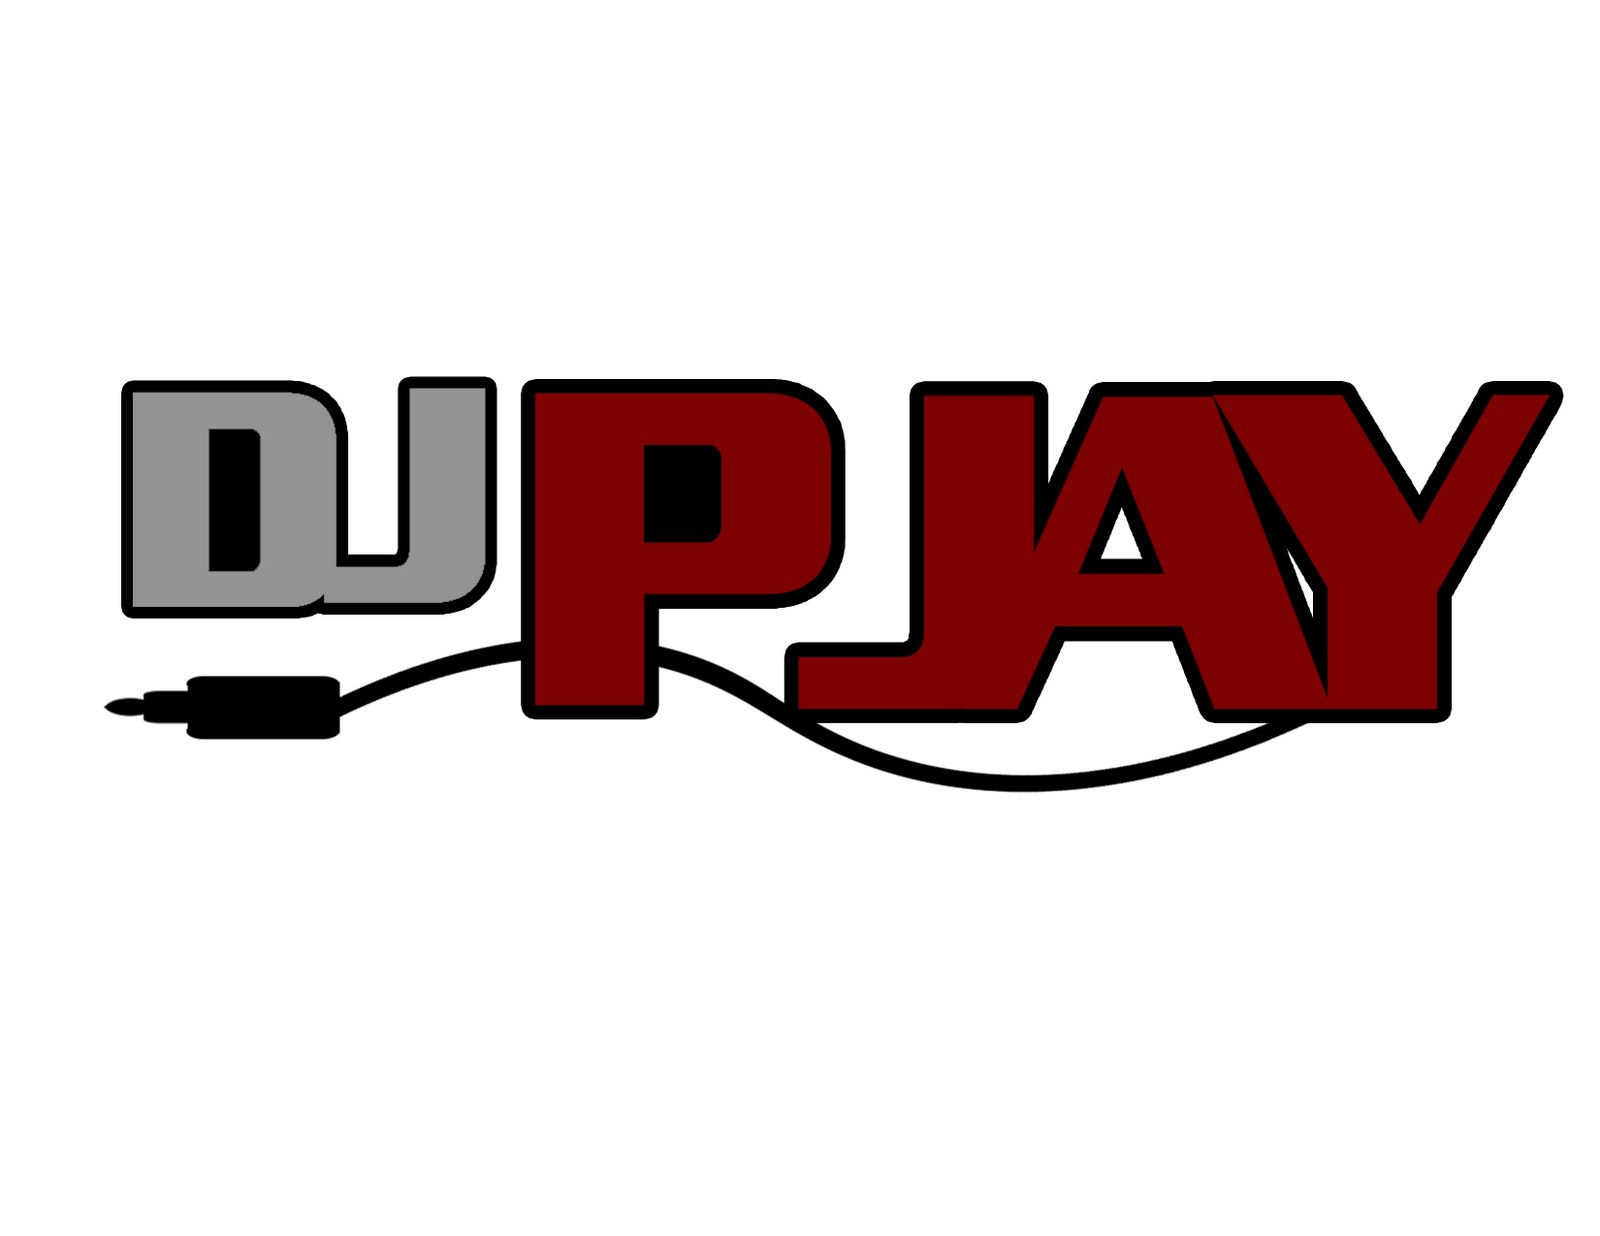 Dj Logo Design Free Related Keywords u0026 Suggestions - Dj Logo Design ...